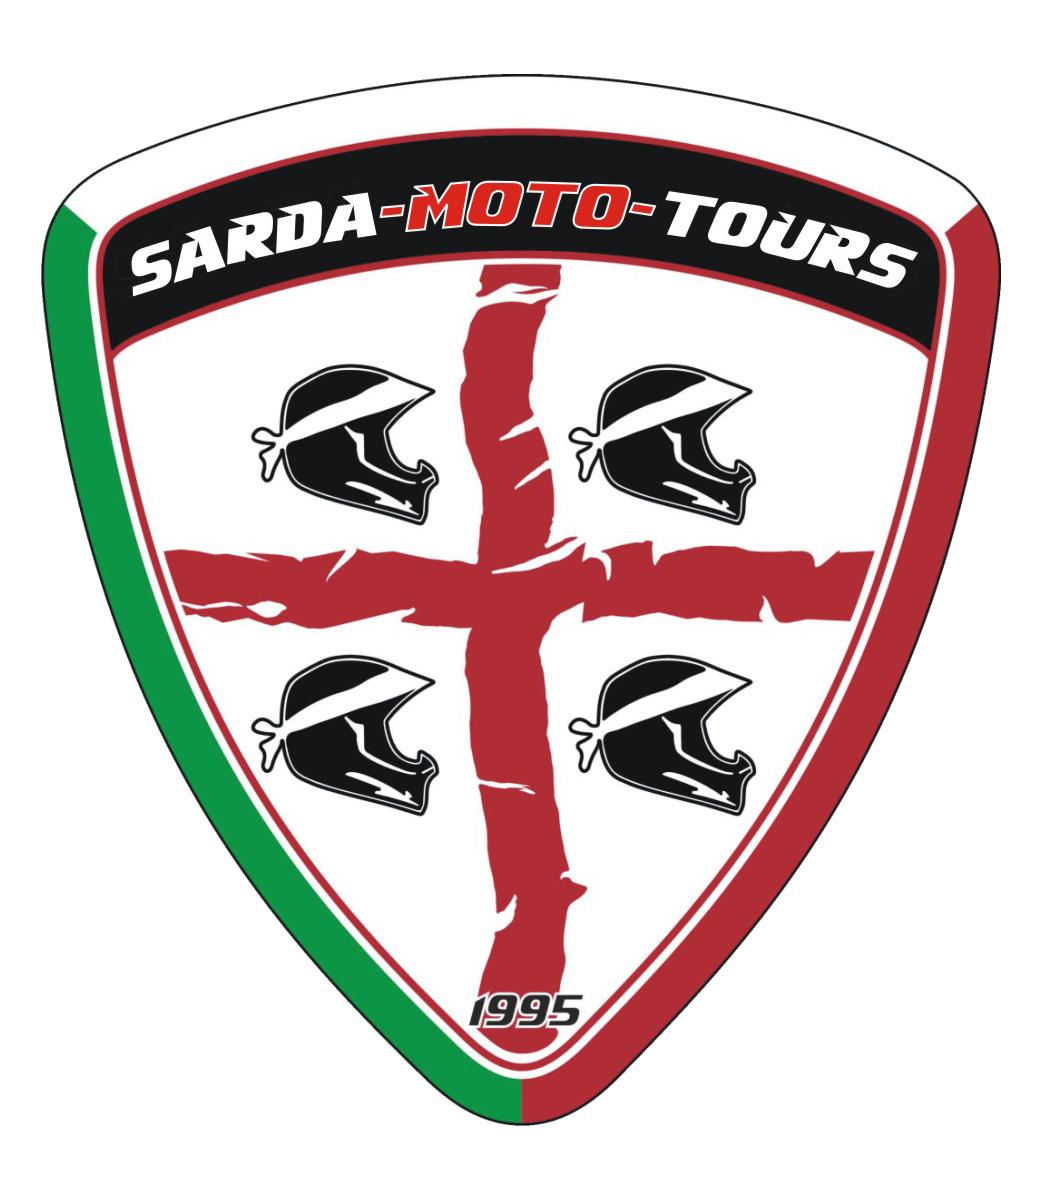 Sardinien Motorradurlaub by Sarda-Moto-Tours.de